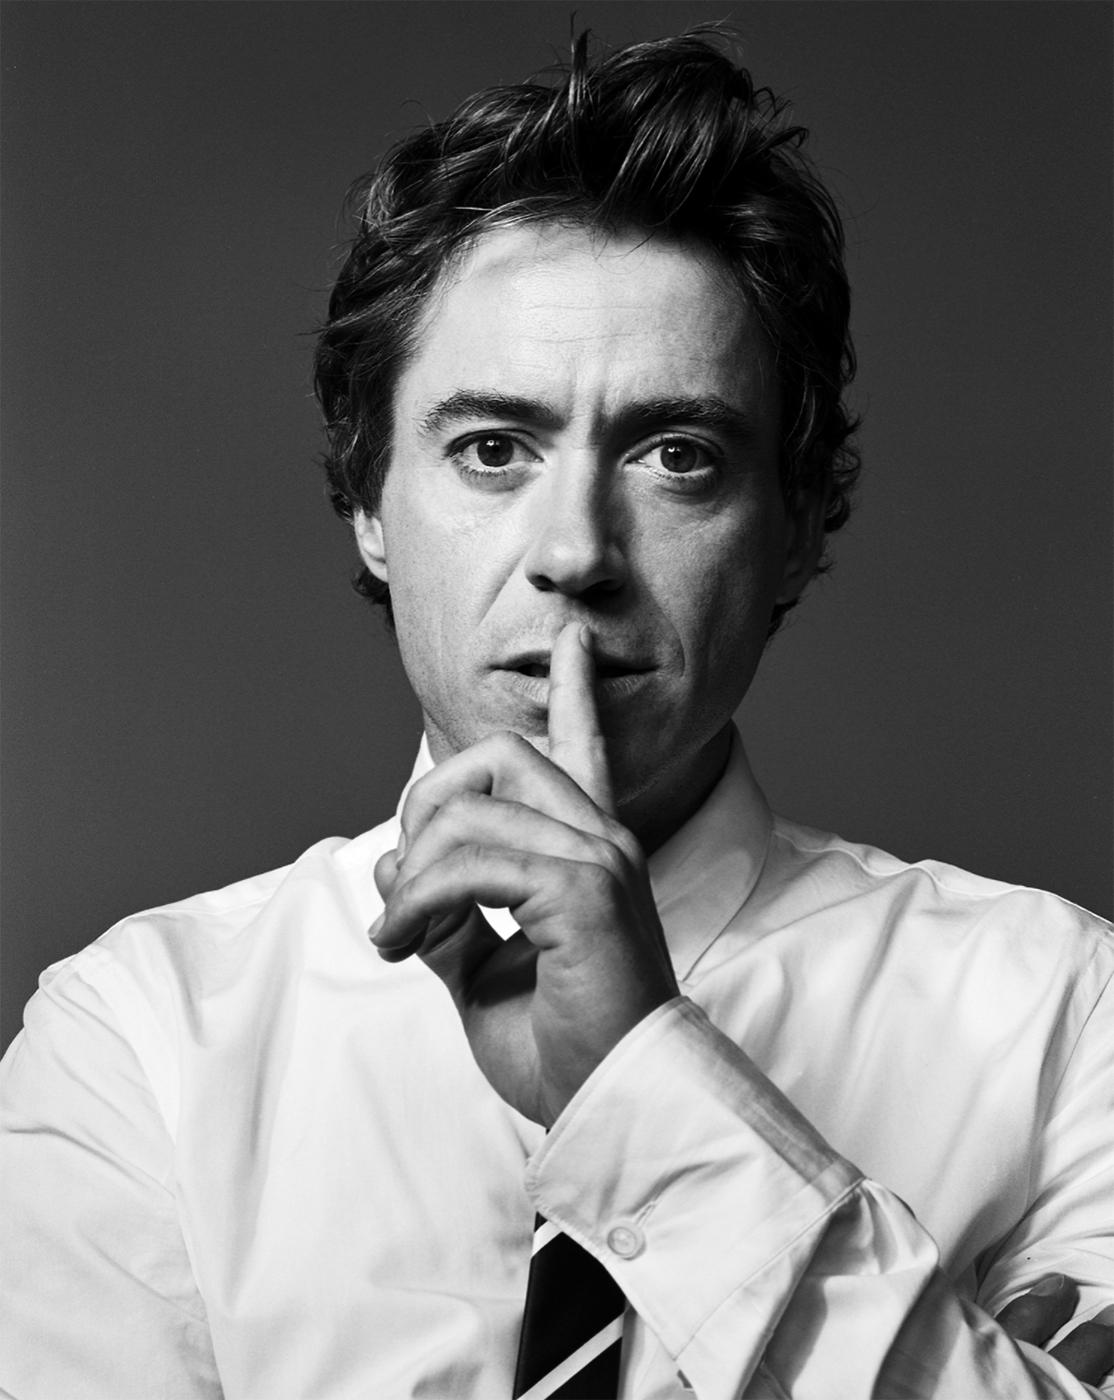 Robert Downey Jr. - Los Angeles, CA